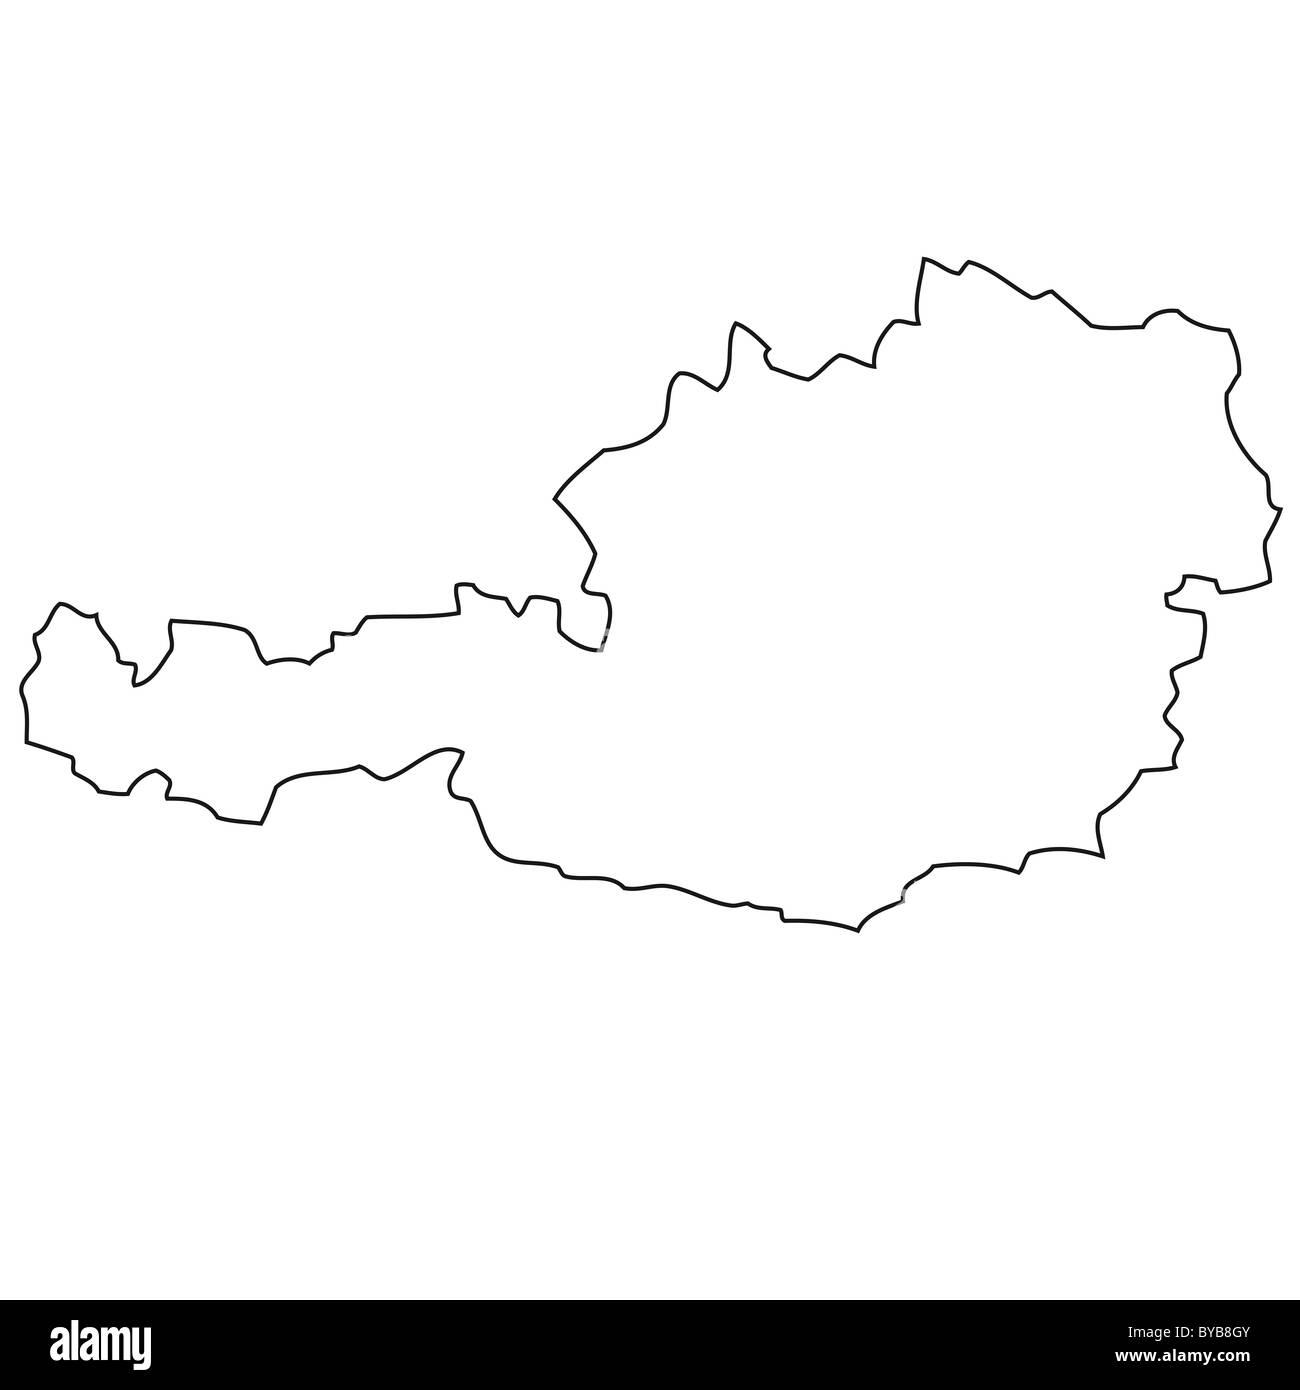 Outline, map of Austria Stock Photo: 34054299 - Alamy